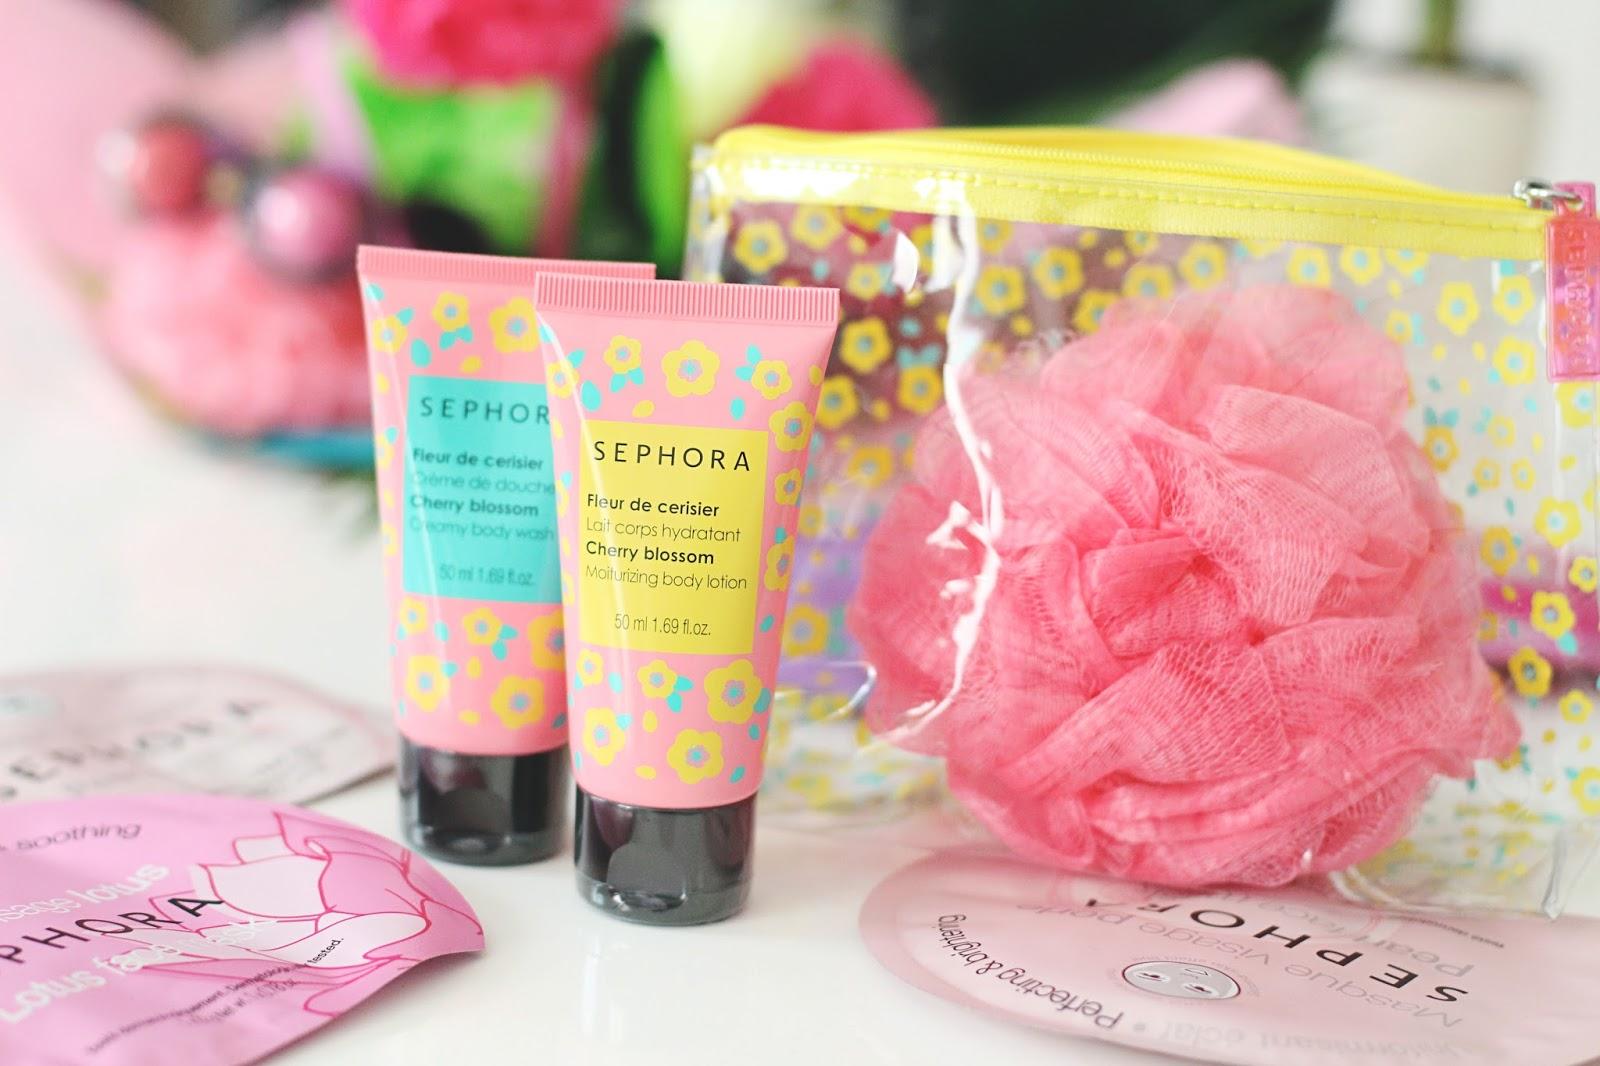 Gamme bain Sephora Fleur de Cerisier